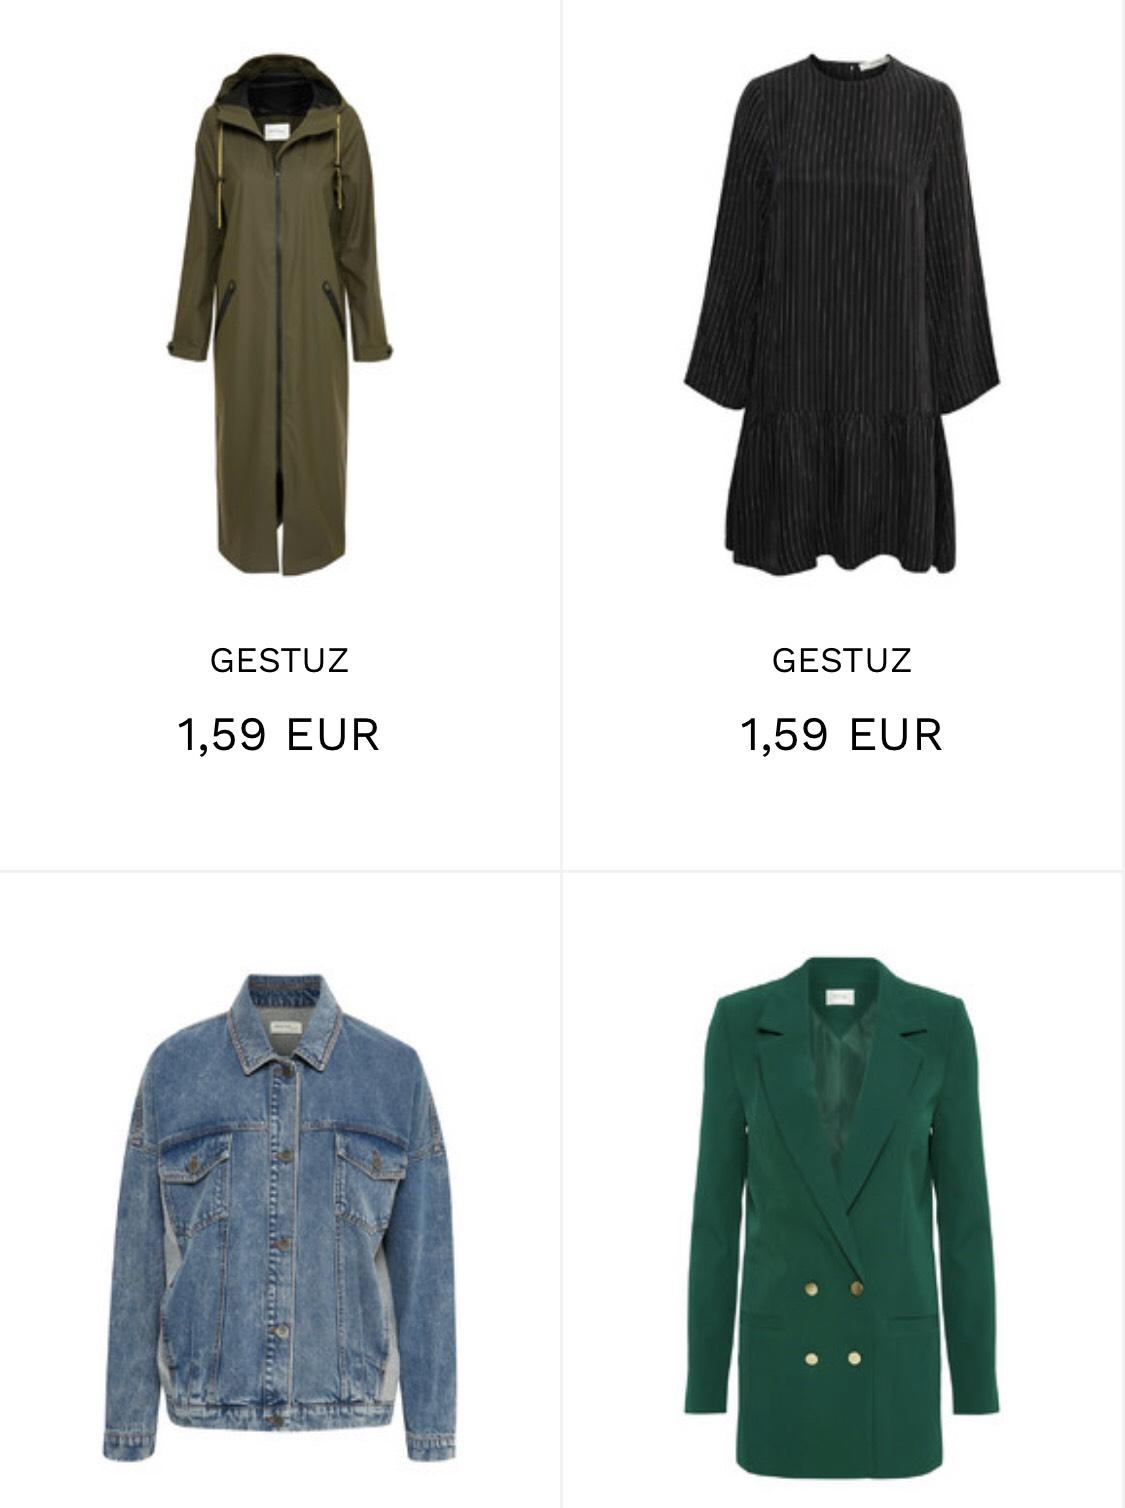 [prijsfout] Verschillende Gestuz kleding @miinto